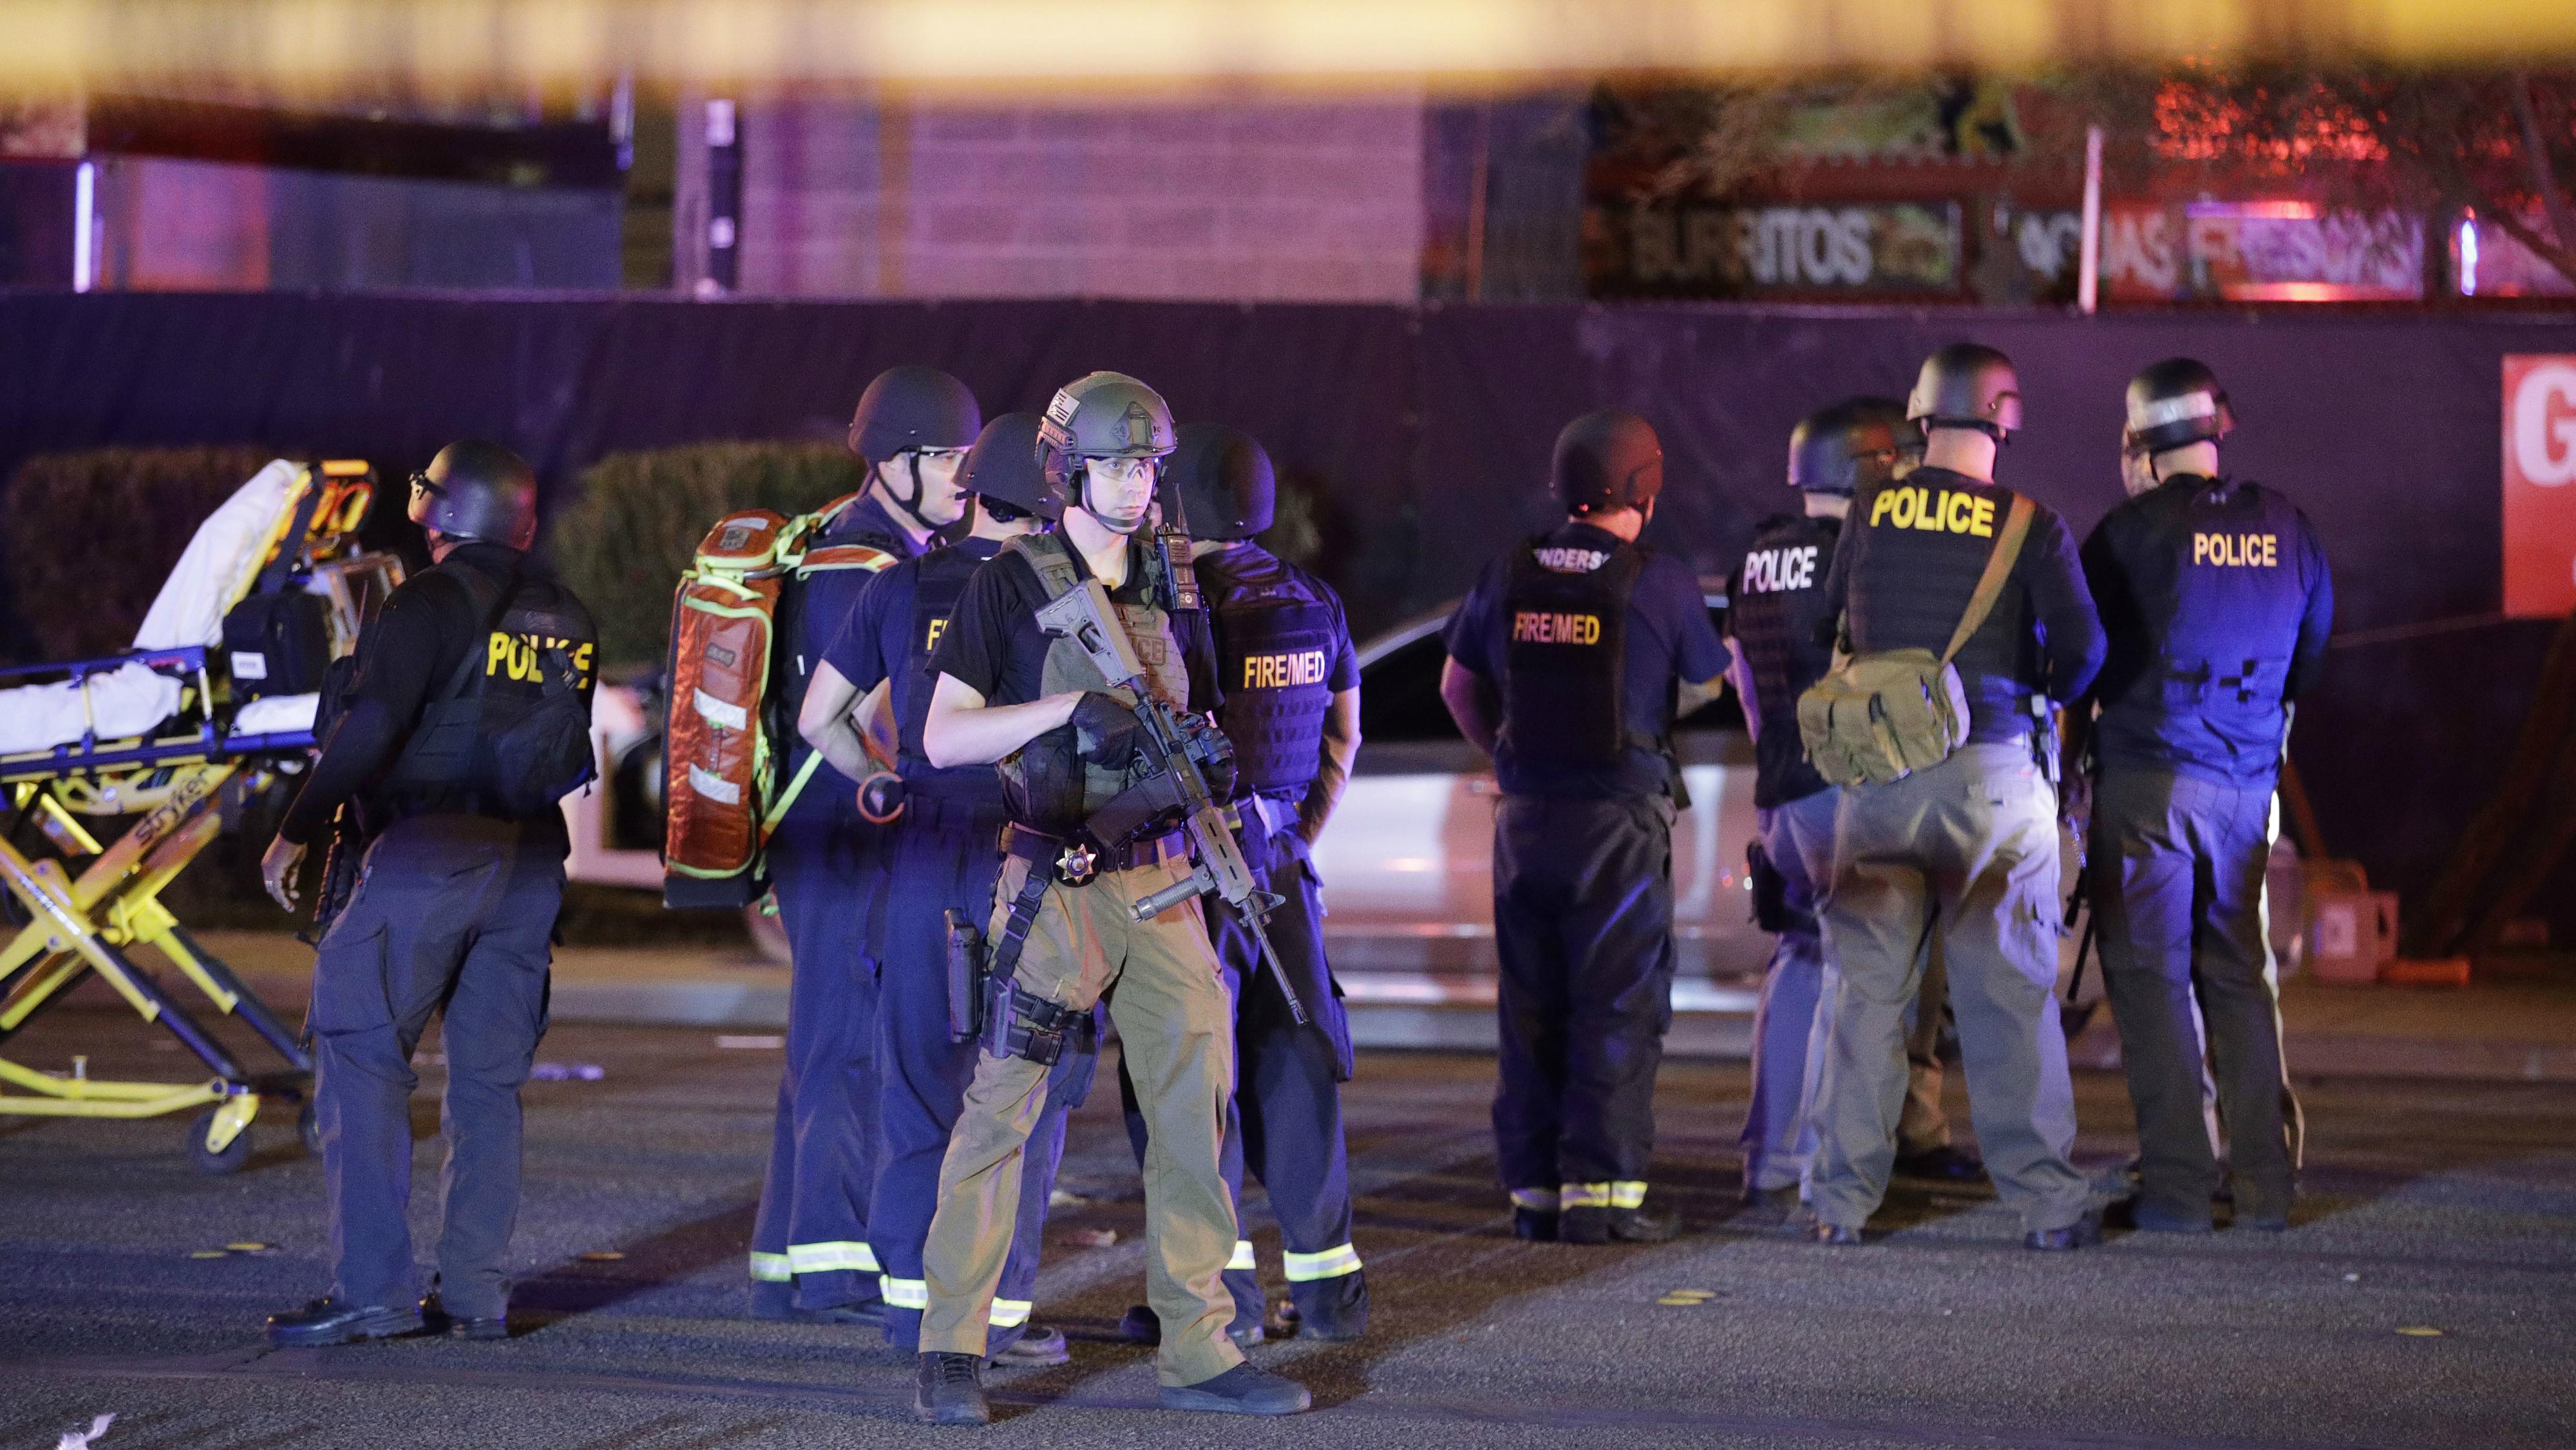 Deadliest mass shooting in the US.